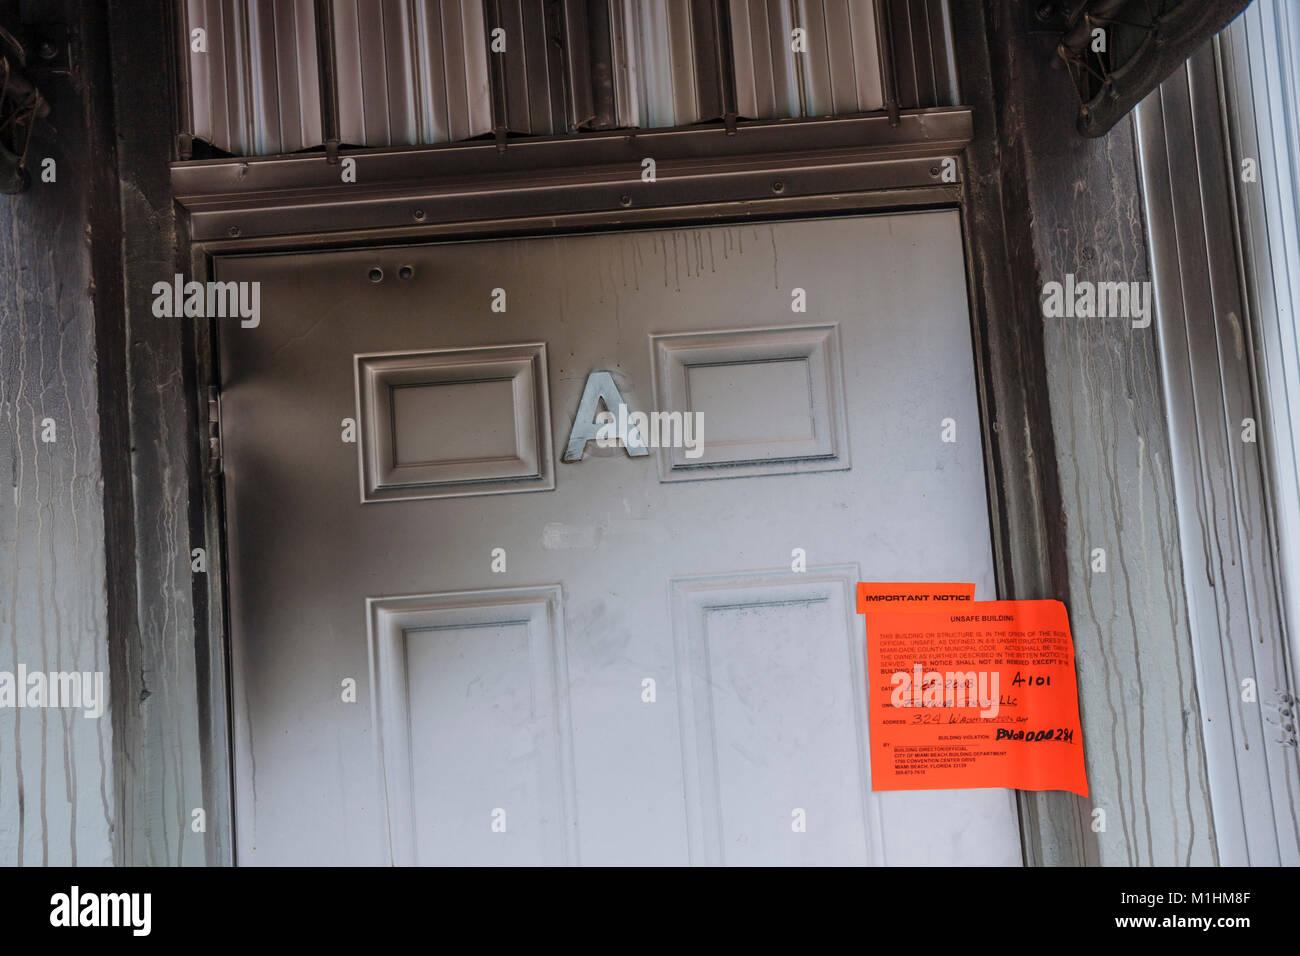 Miami Beach Florida Washington Avenue unsafe building notice residence condominium fire damaged - Stock Image